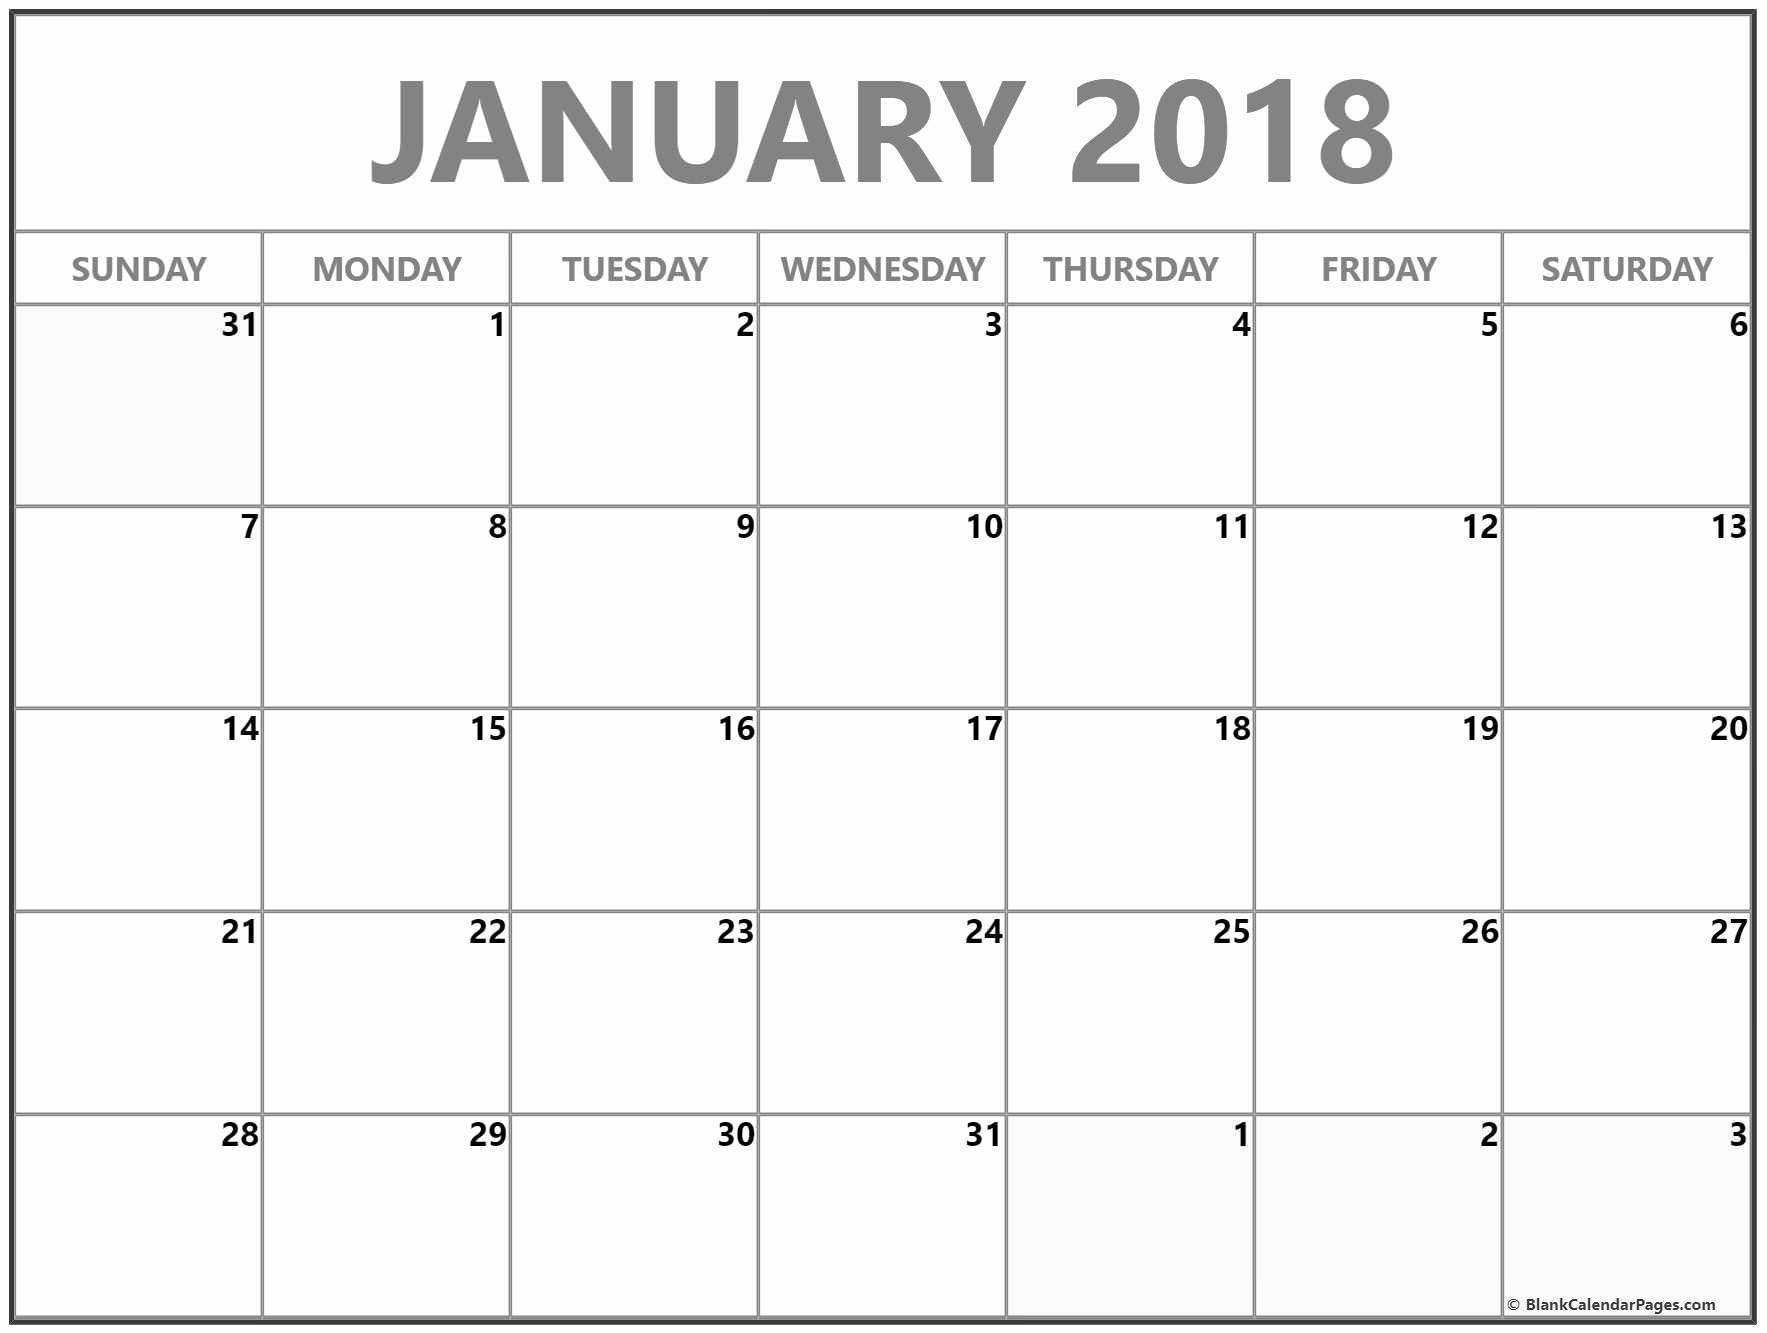 Blank January 2018 Calendar Printable Elegant January 2018 Free Printable Blank Calendar Collection